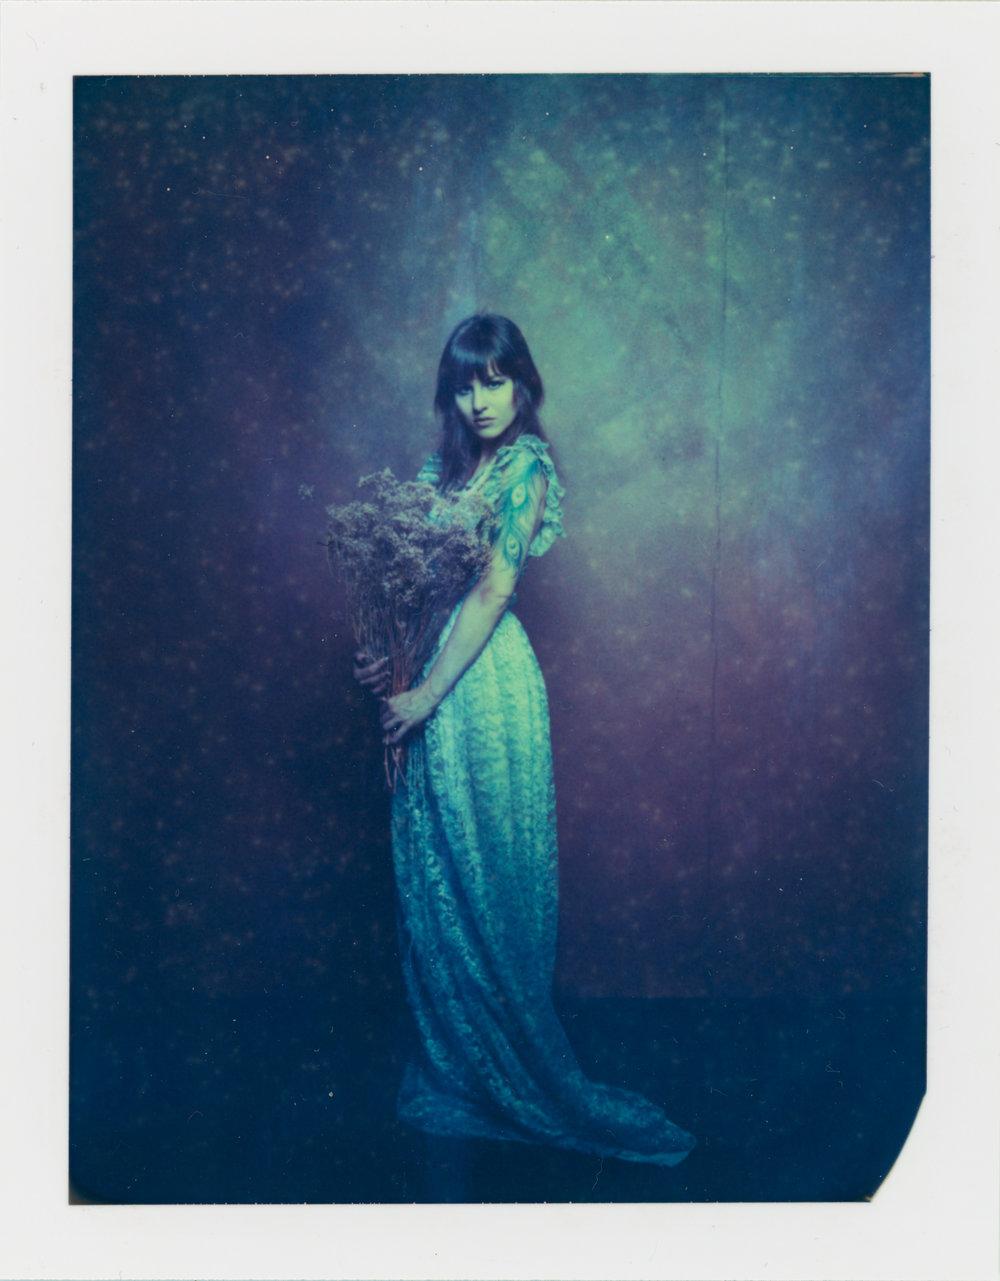 Samira | Polaroid 600SE | Polaroid 669 Film | Stefan Merz